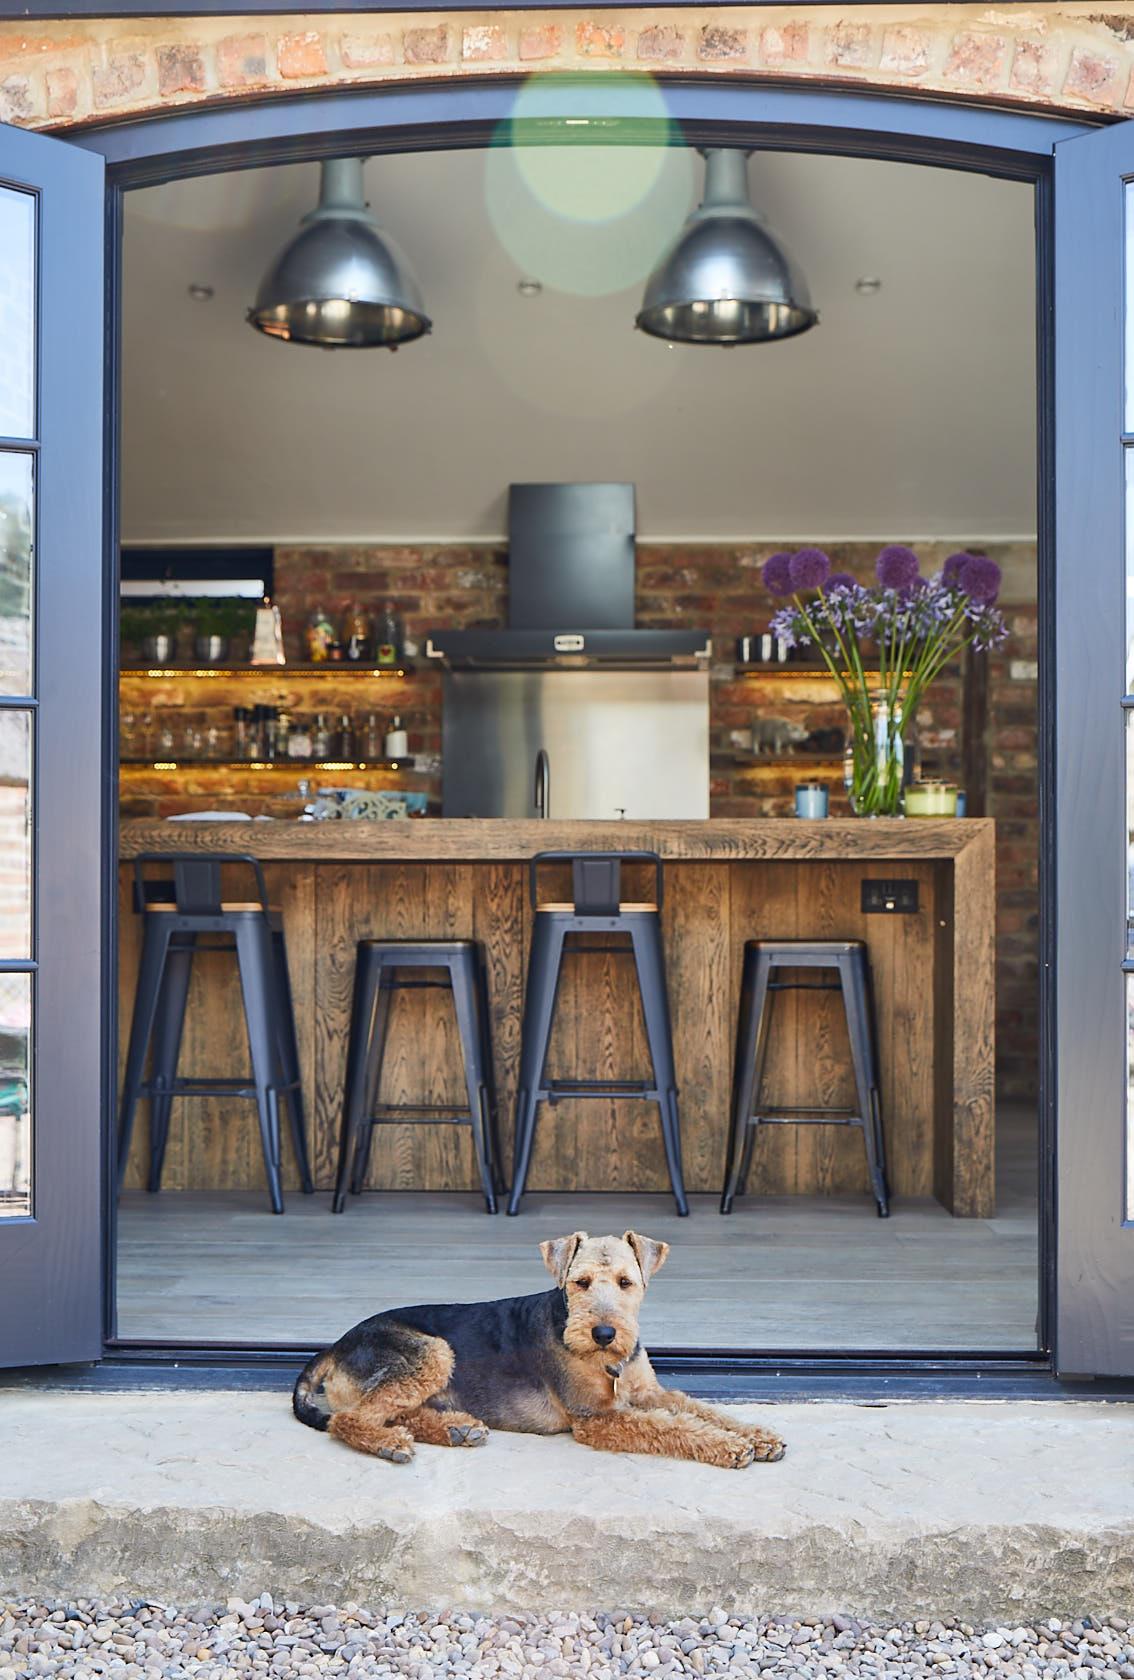 Dog sat outside in front of bespoke industrial kitchen